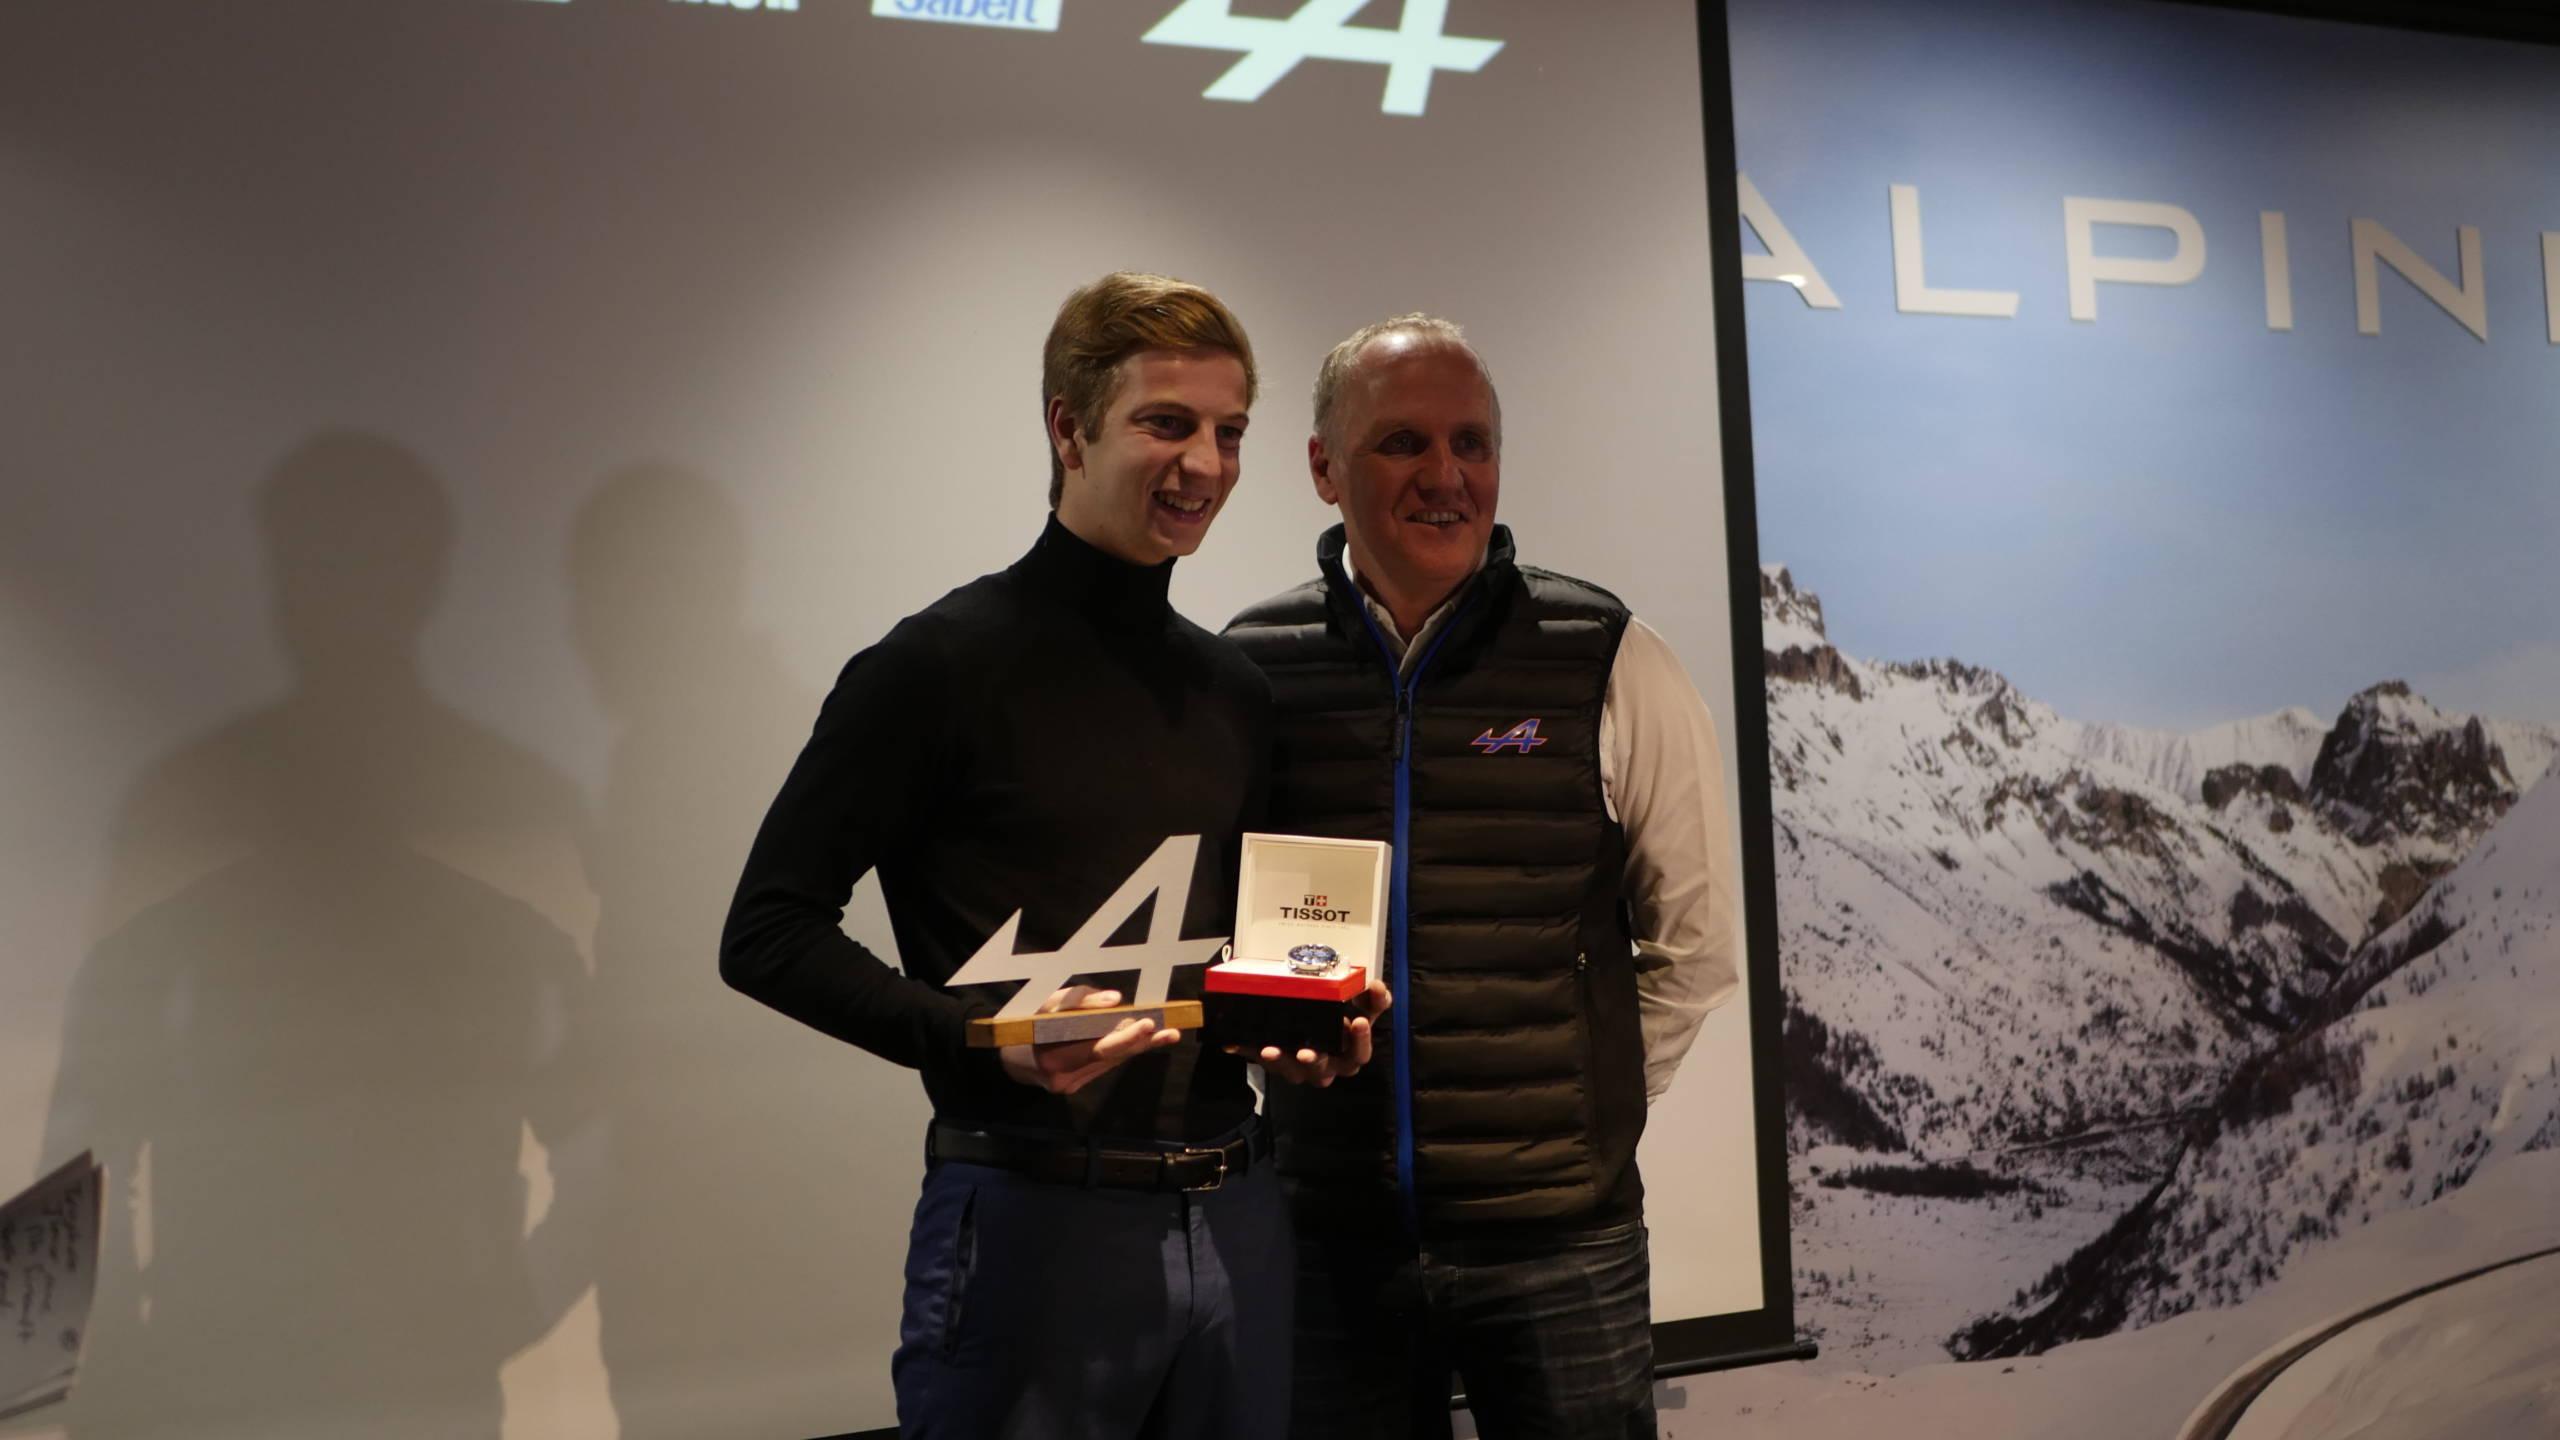 Soirée Alpine Elf Europa Cup 2018 récompense Showroom CMR 1 | Alpine Elf Europa Cup: par ici le programme 2019 !